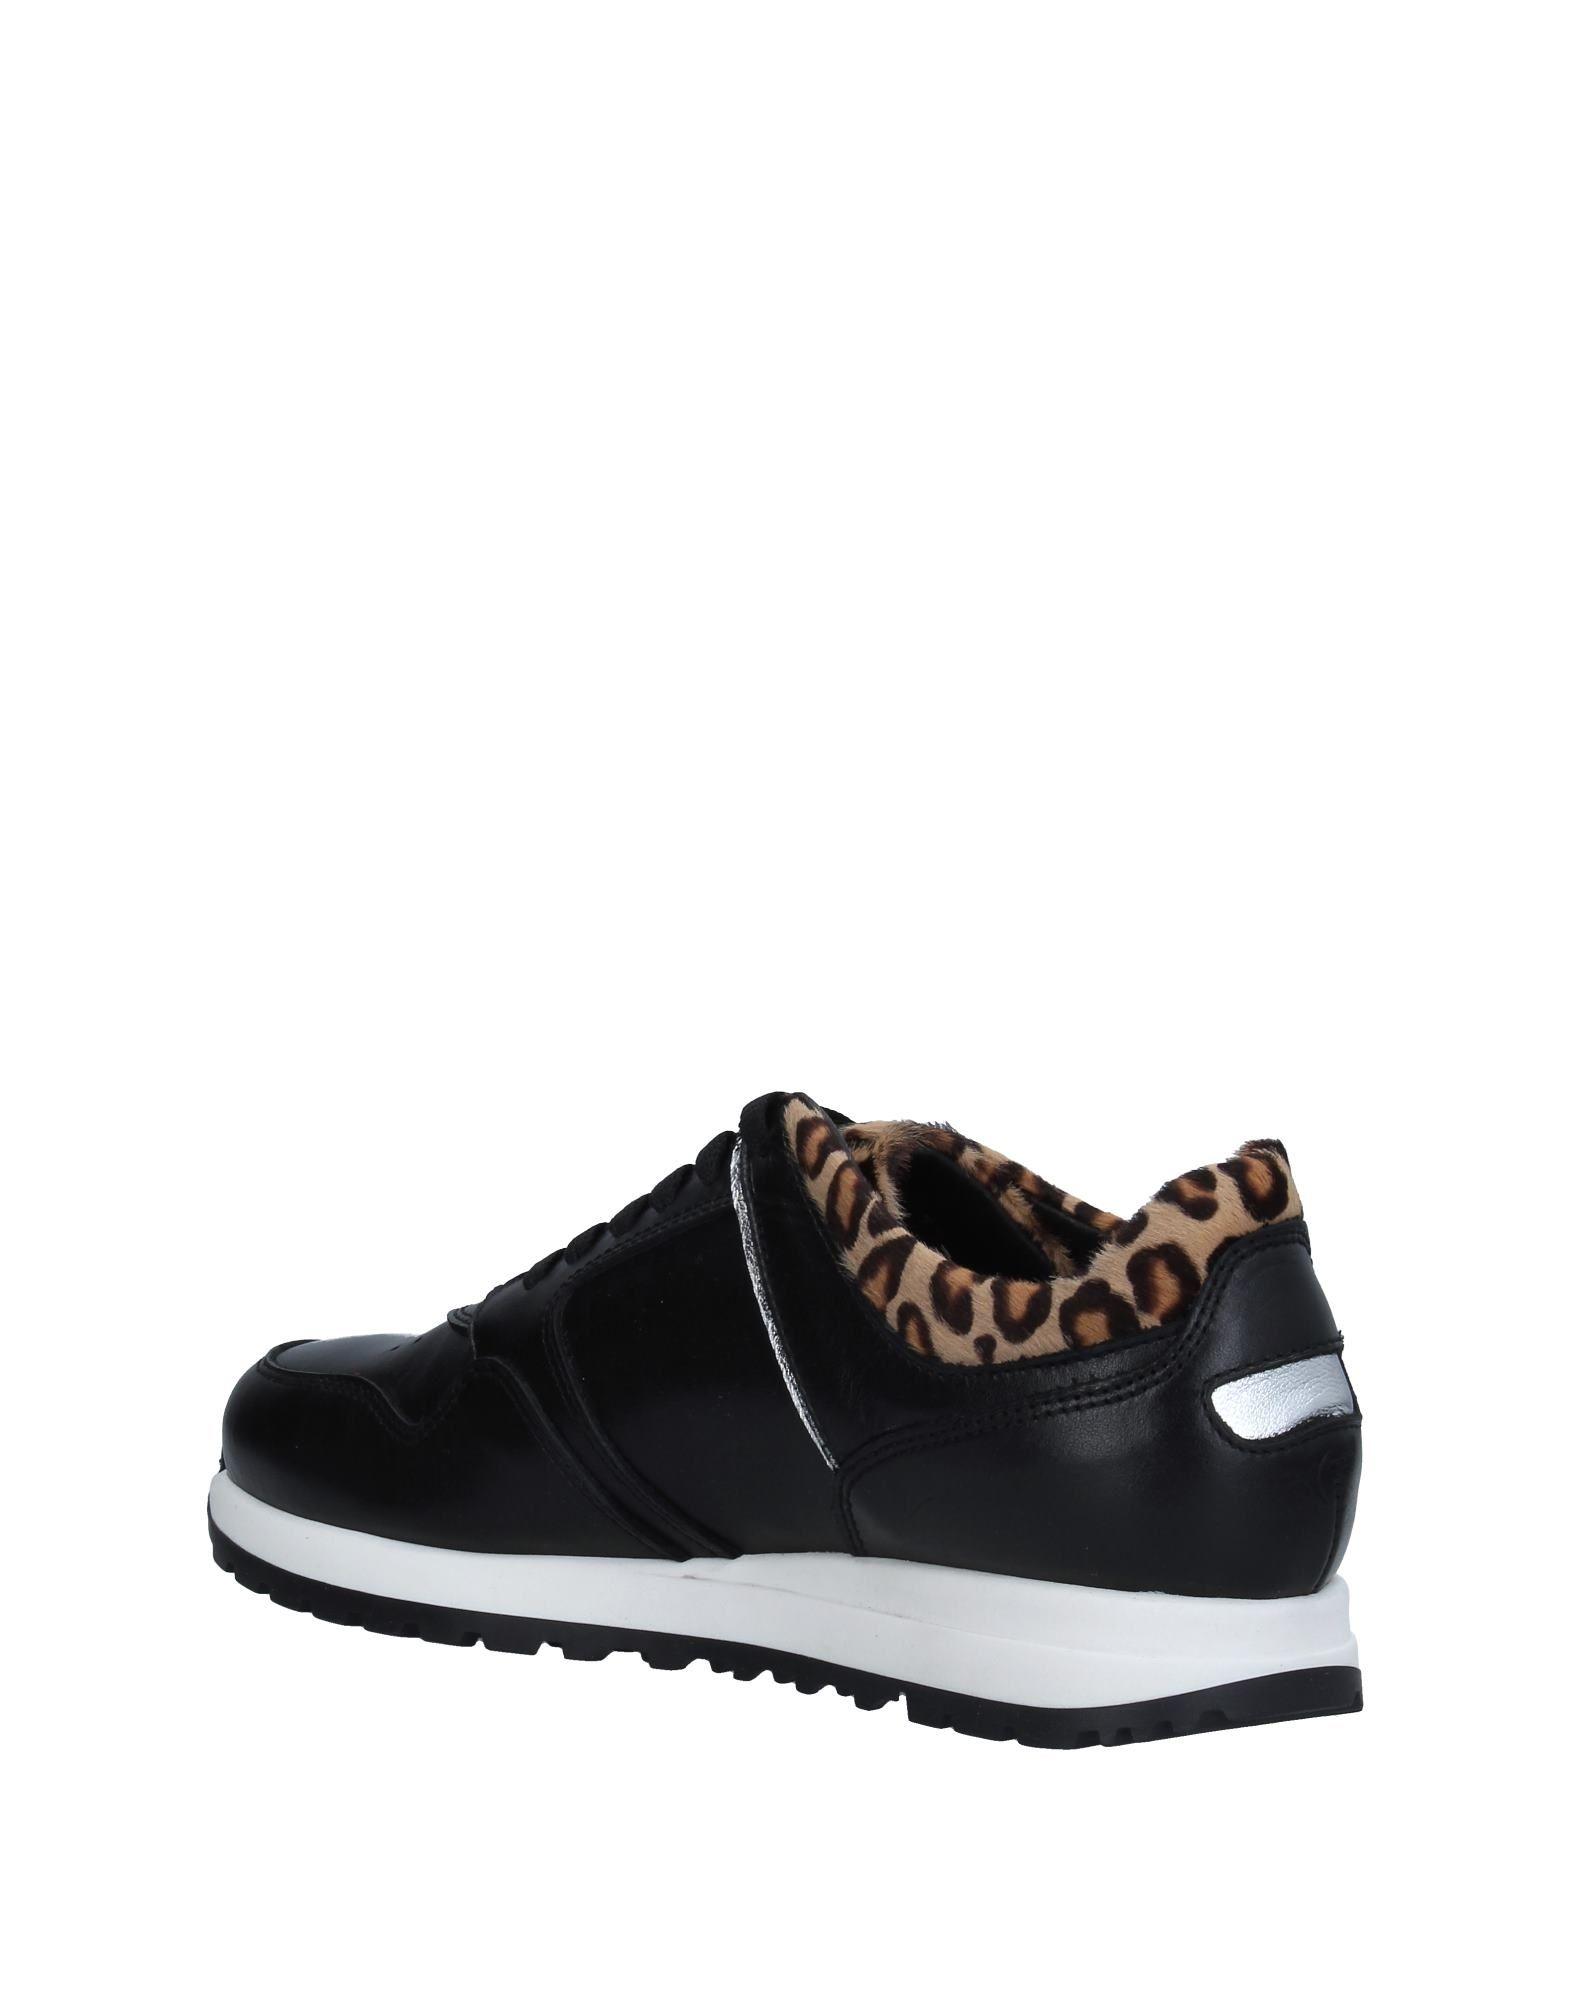 Sneakers Gianfranco Lattanzi Donna Donna Lattanzi - 11305824KA caf88d